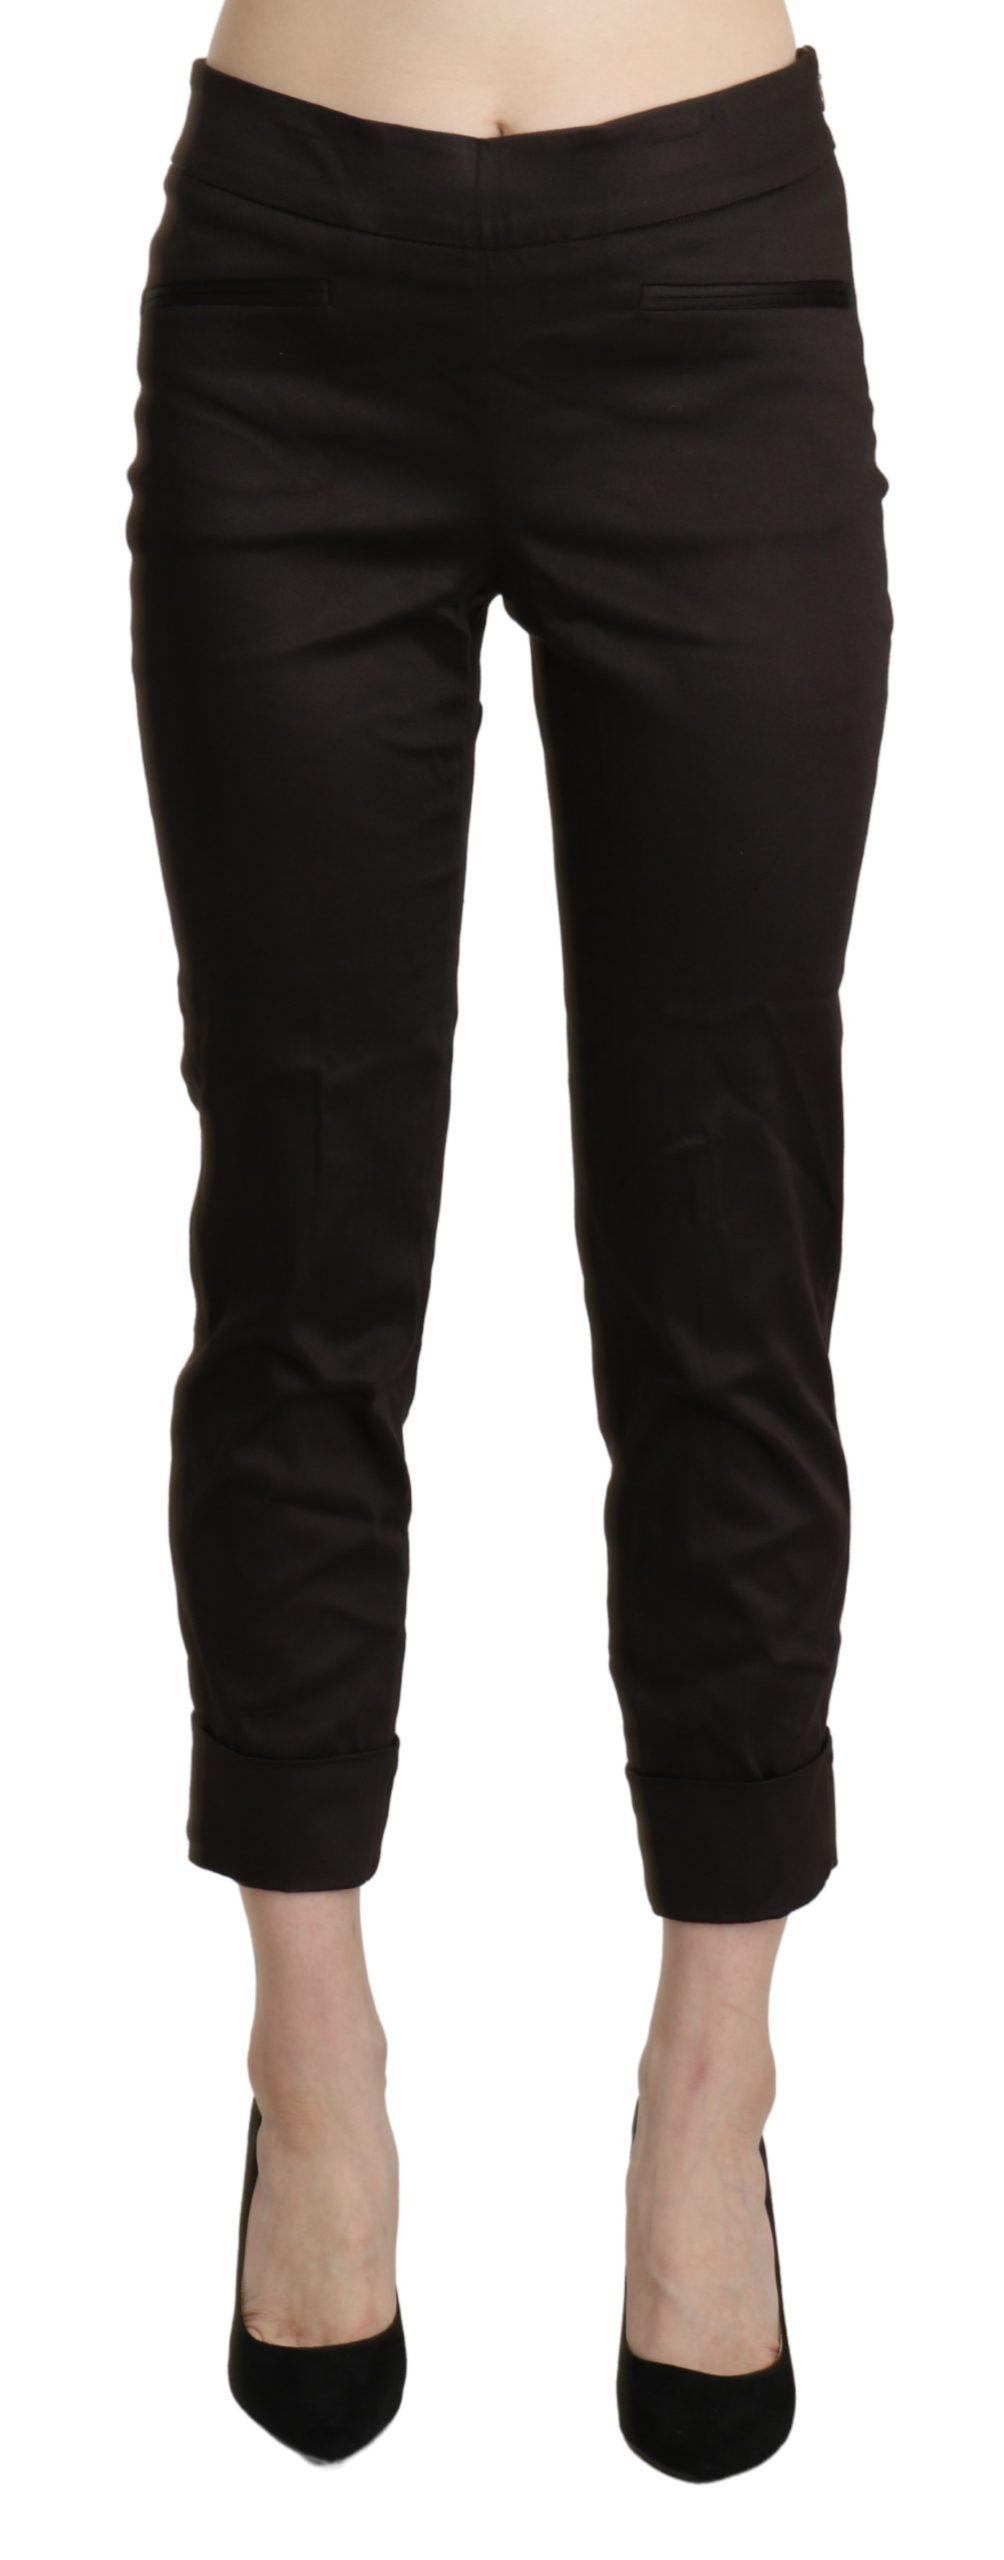 BENCIVENGA Women's Mid Waist Skinny Cropped Trousers Brown PAN71329-42 - IT42 M